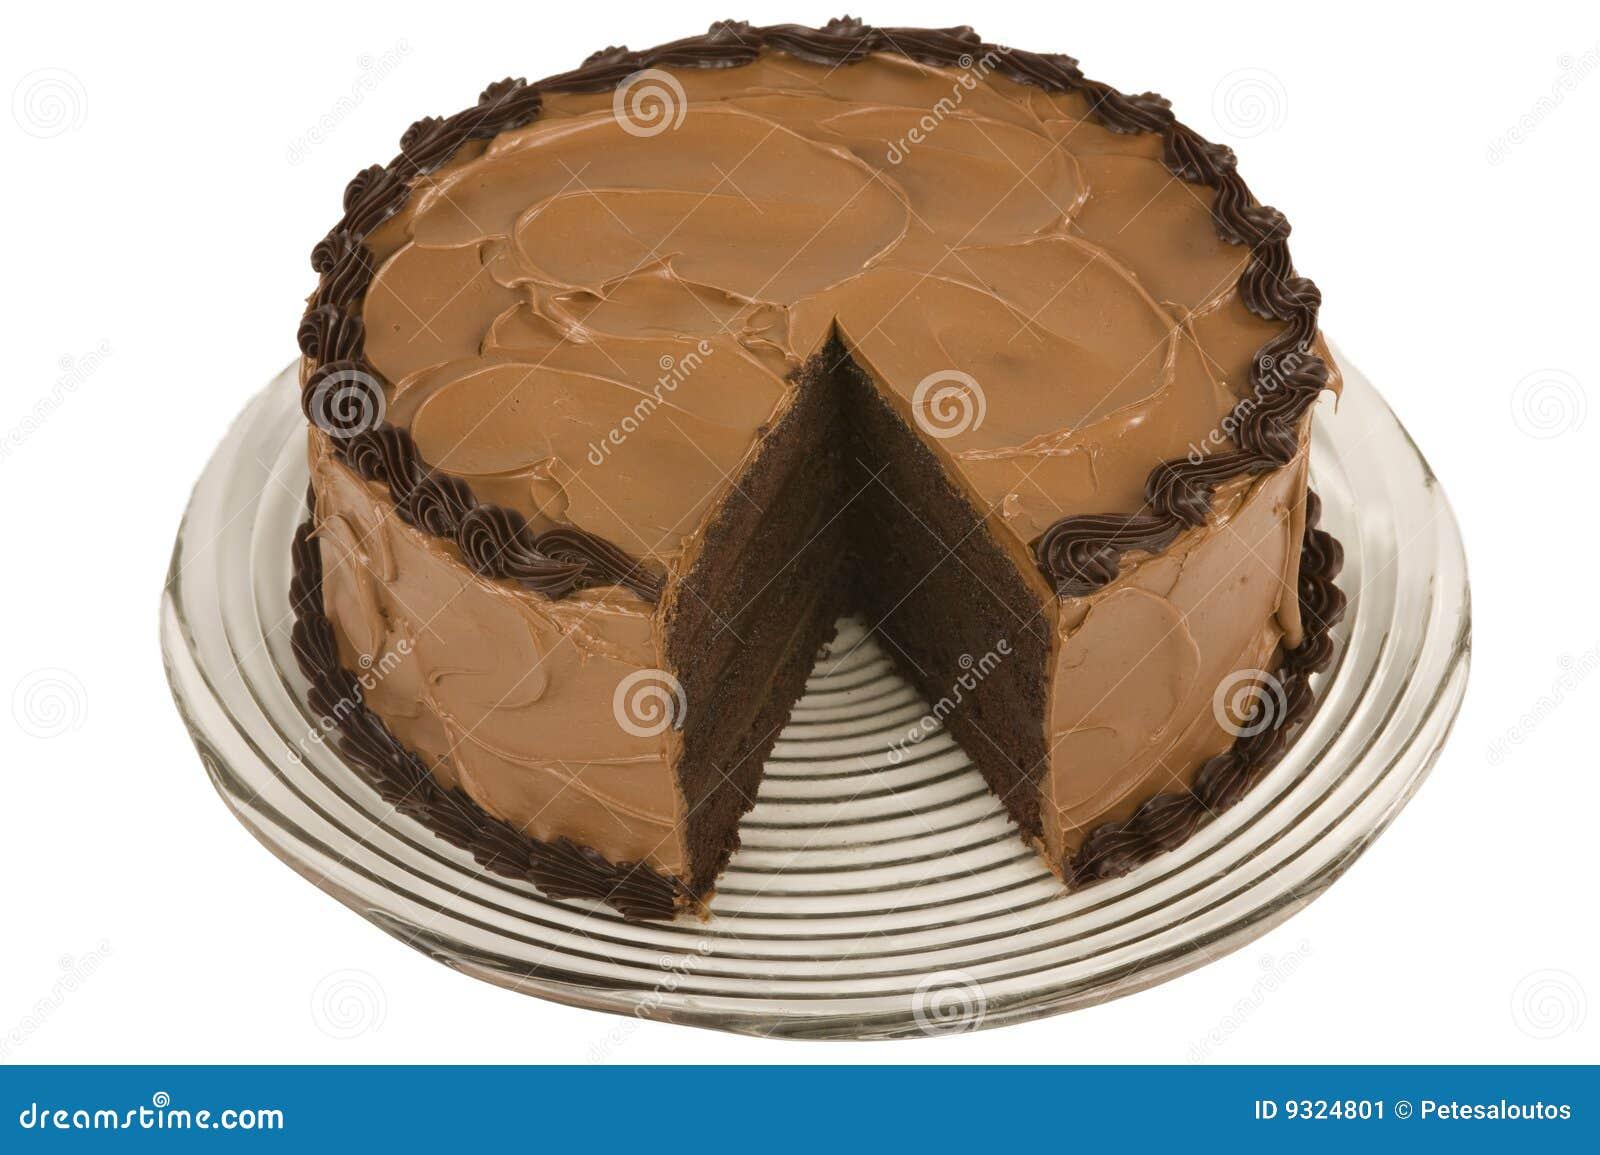 Chocolate Cake Icing Homemade